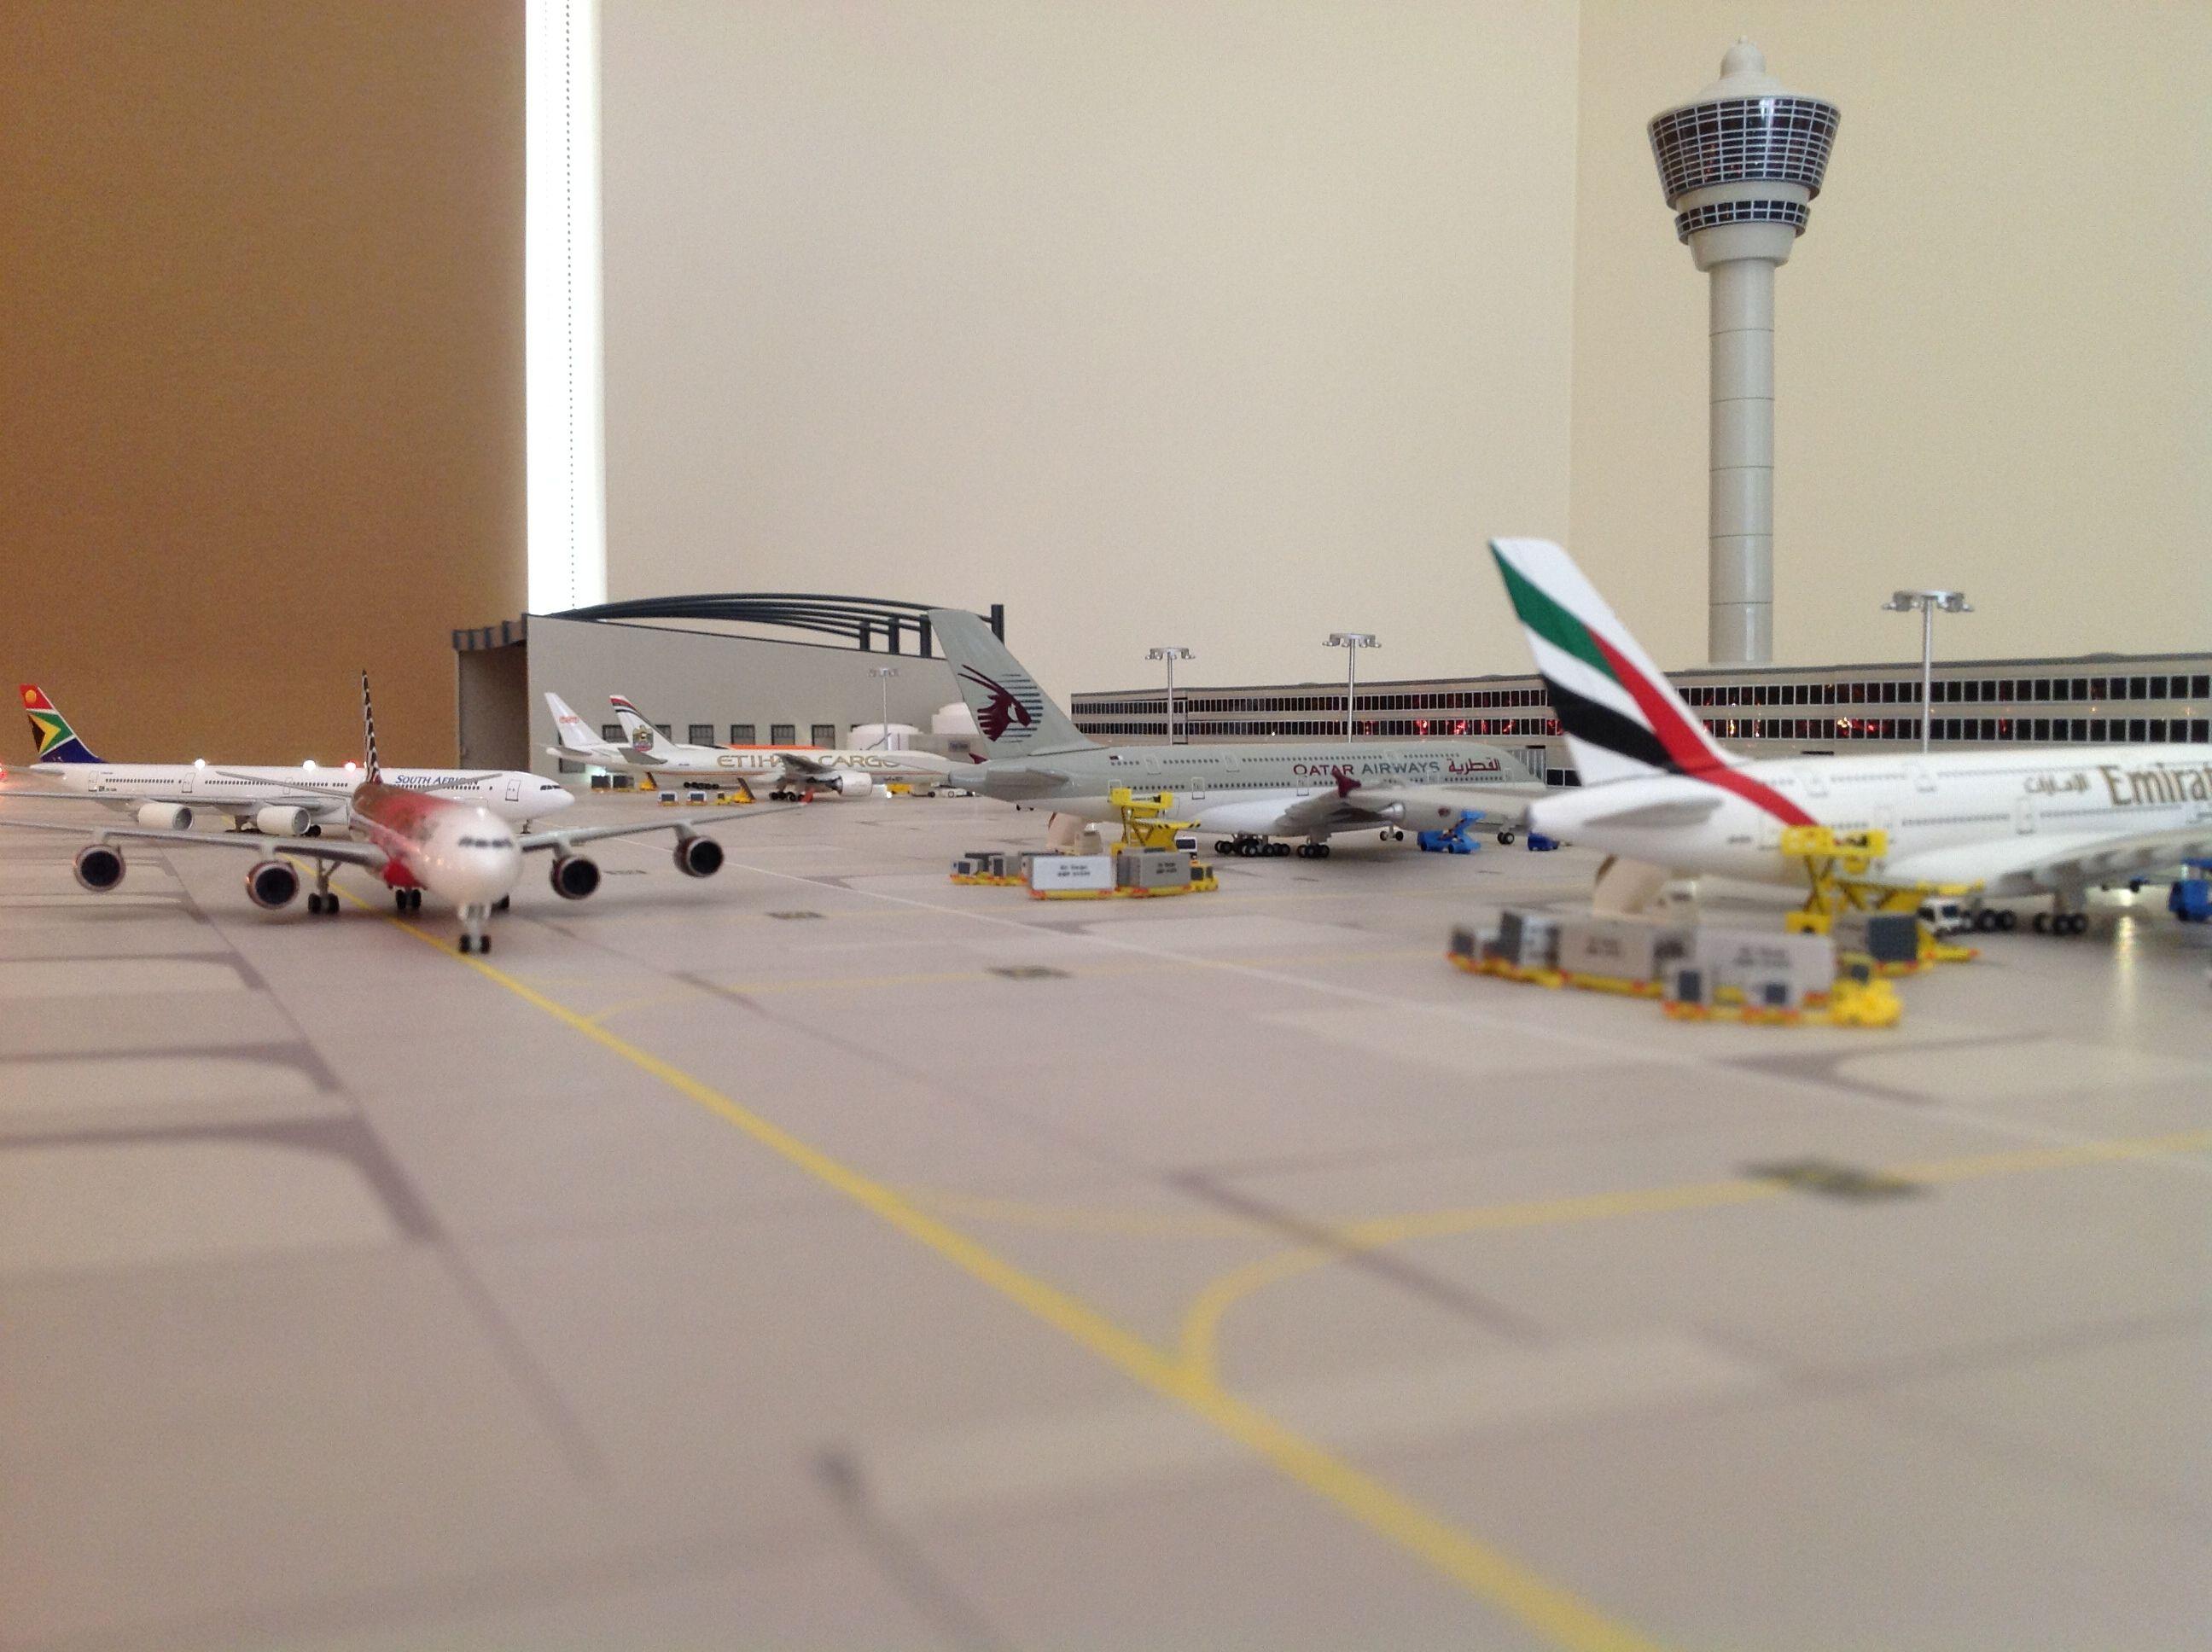 Herpa 1 500 Airport Diarama Airport Scale Models Passenger Jet